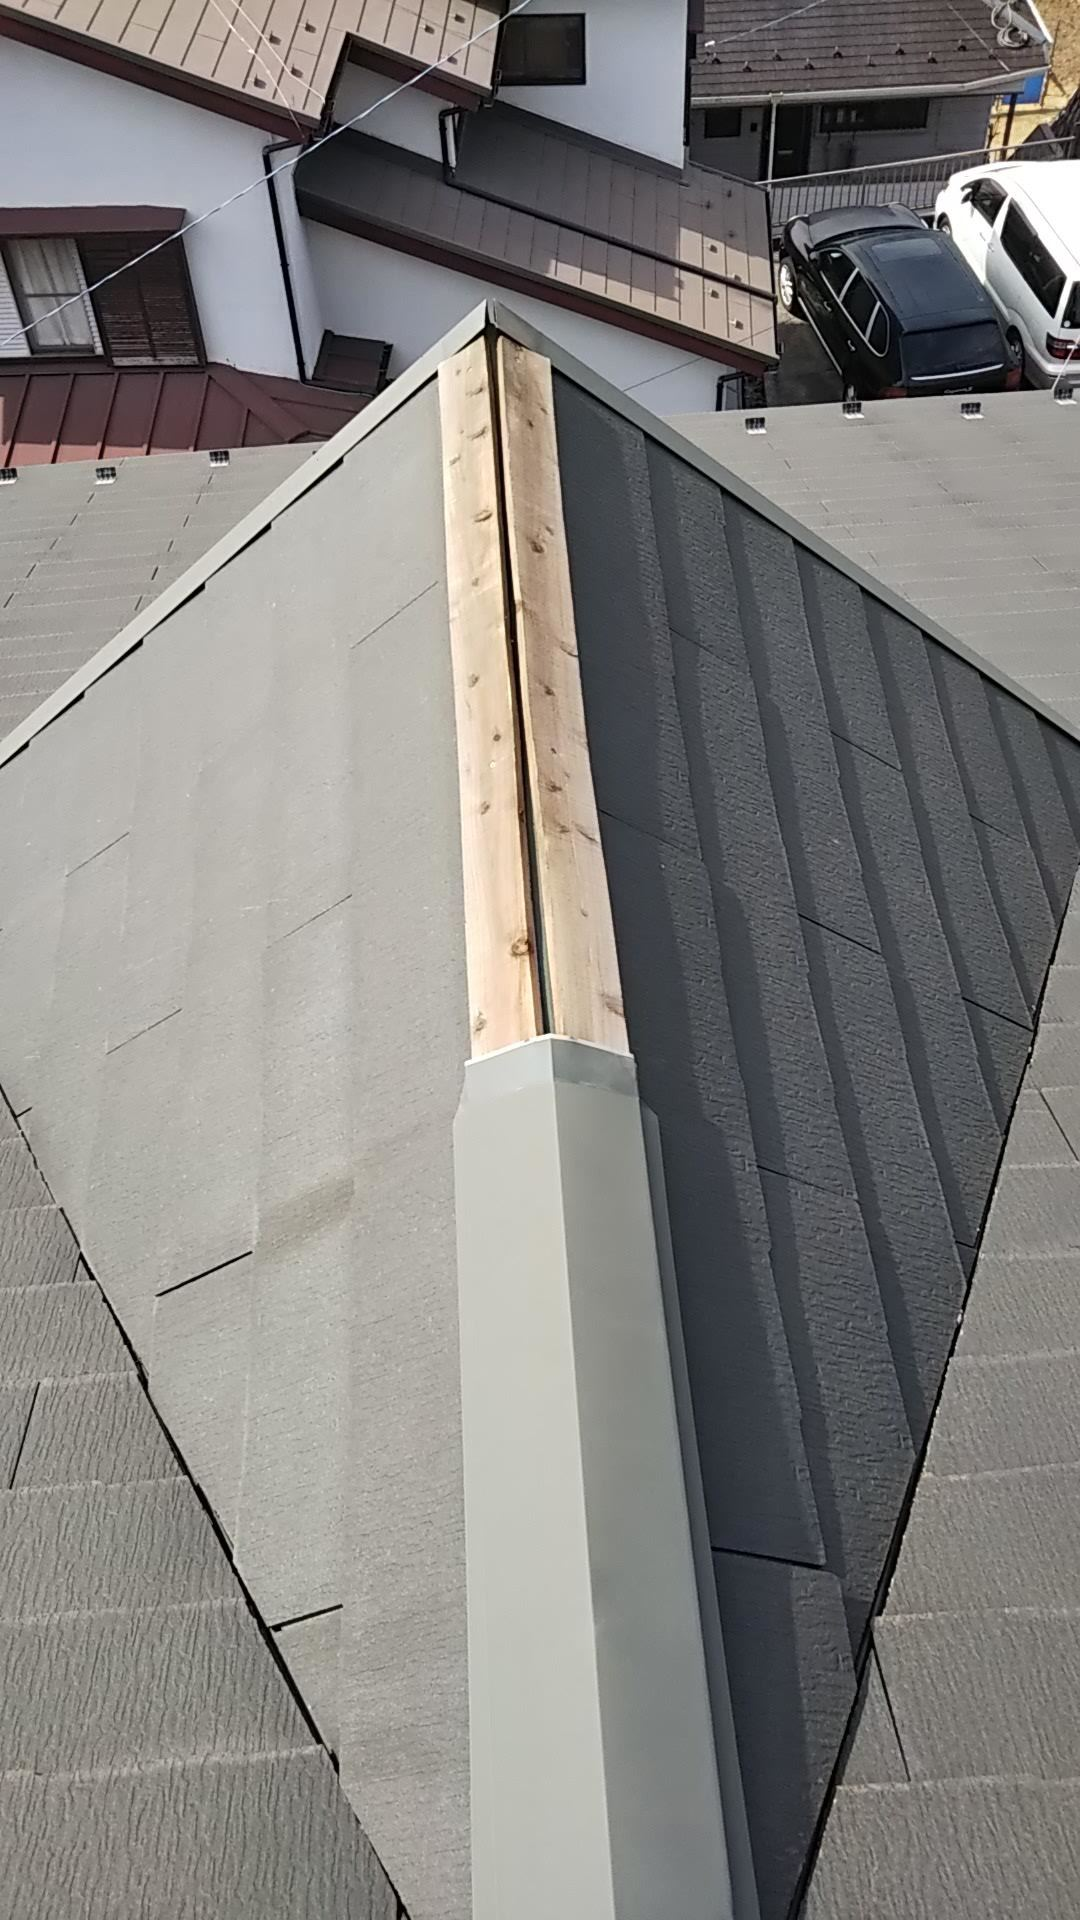 屋根の棟板金_d0358411_19090978.jpg